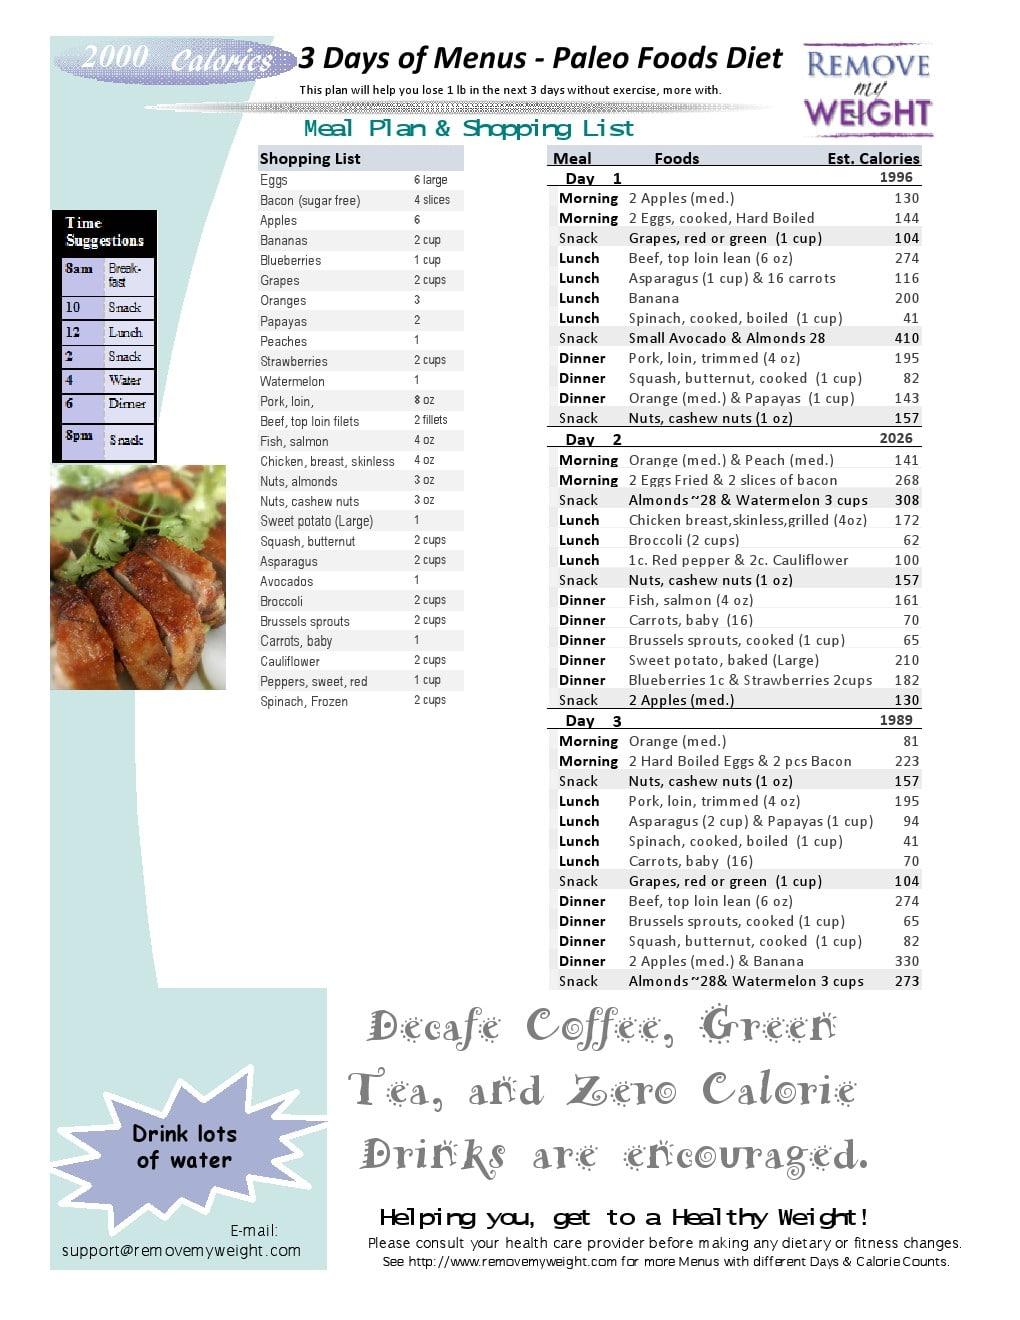 Paleo Diet 3 Day Menu Plan at 2000 Calories a day